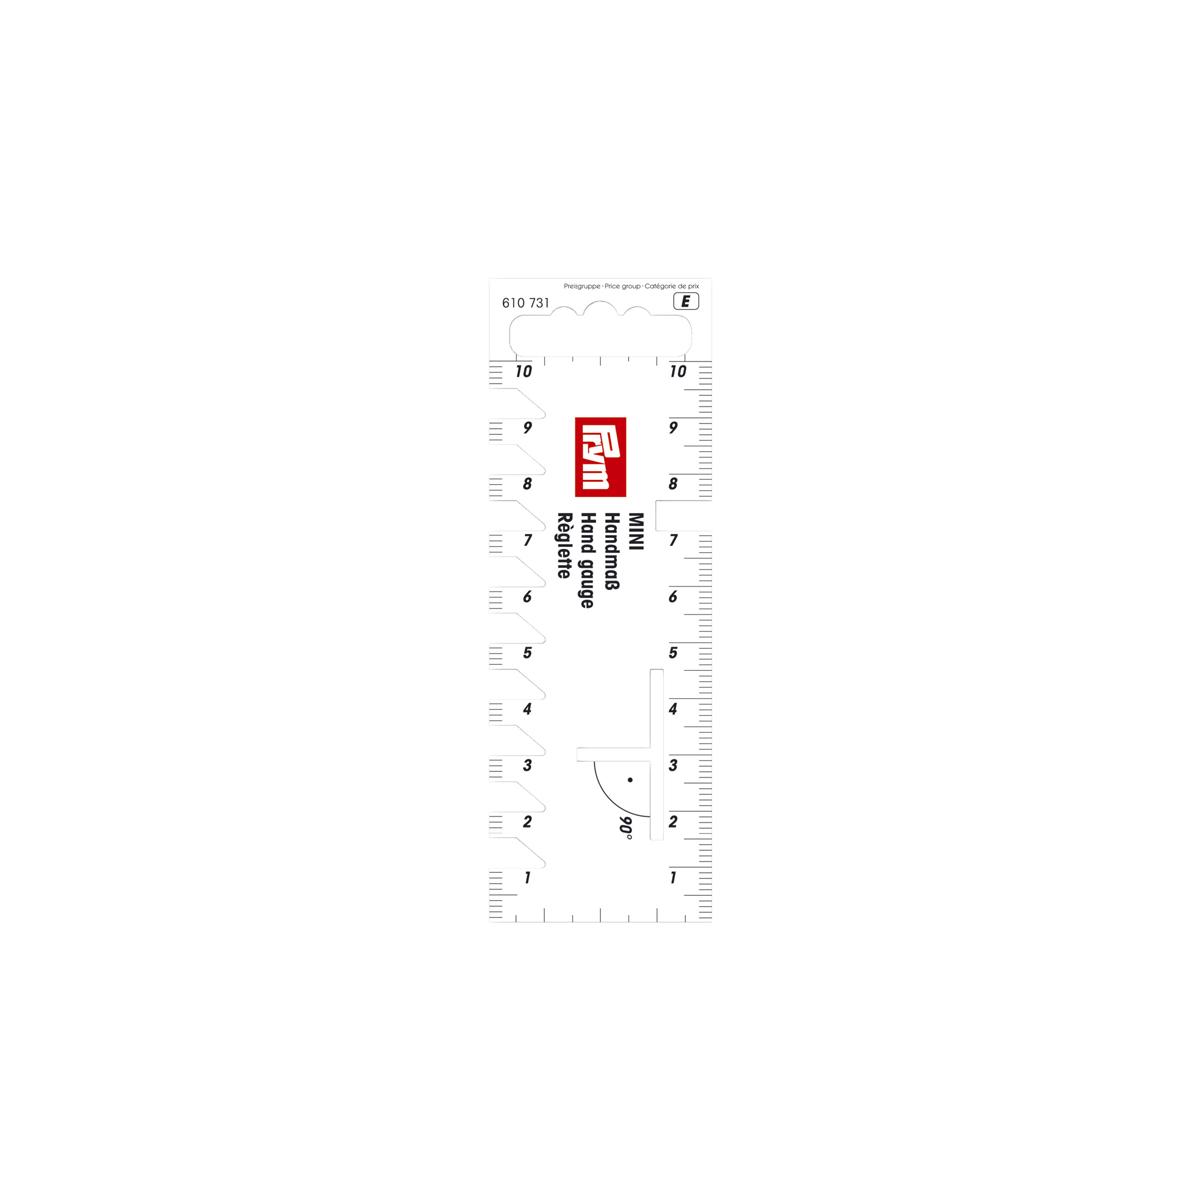 610731 Шаблон мини-линейка для разметки и измерения Prym